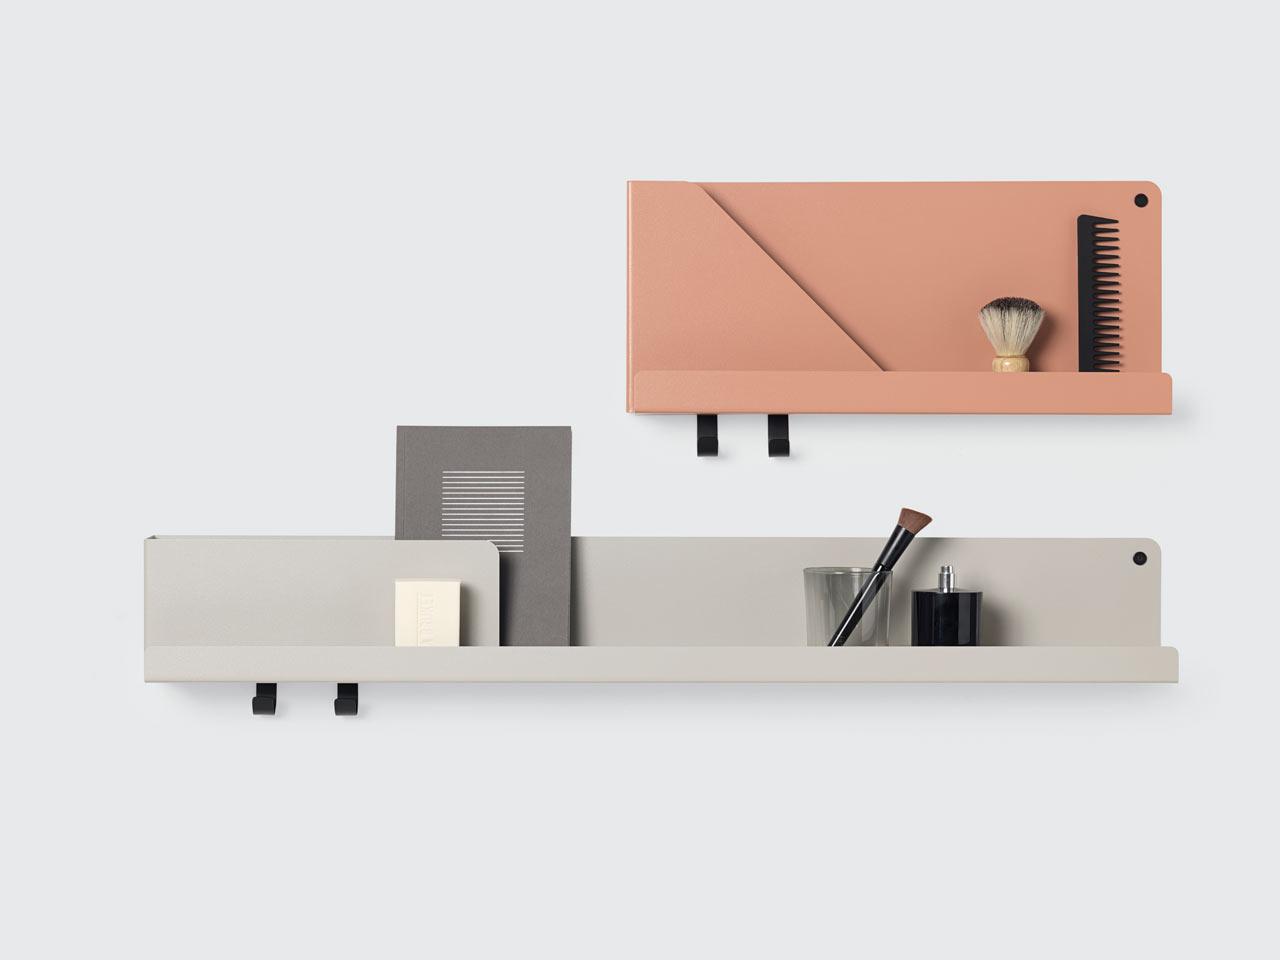 Folded-Shelf-Muuto-Johan-van-Hengel-4